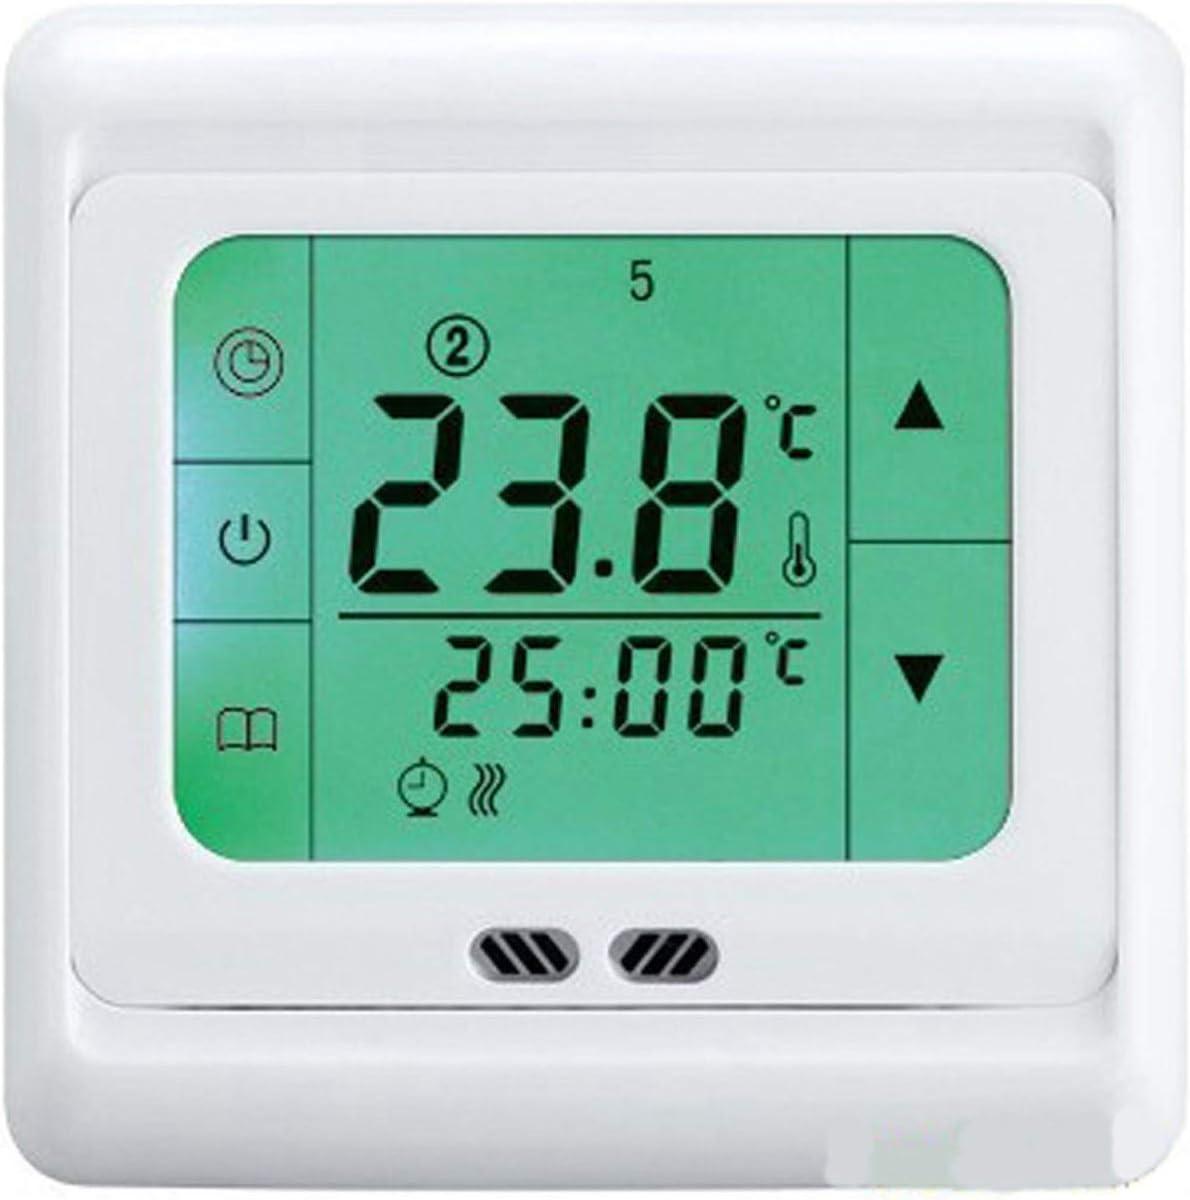 Featuring Intelligent Digital Control Thermostat Nassboards Premium Pro Electric Underfloor Heating Mat Kit 200w Per m2